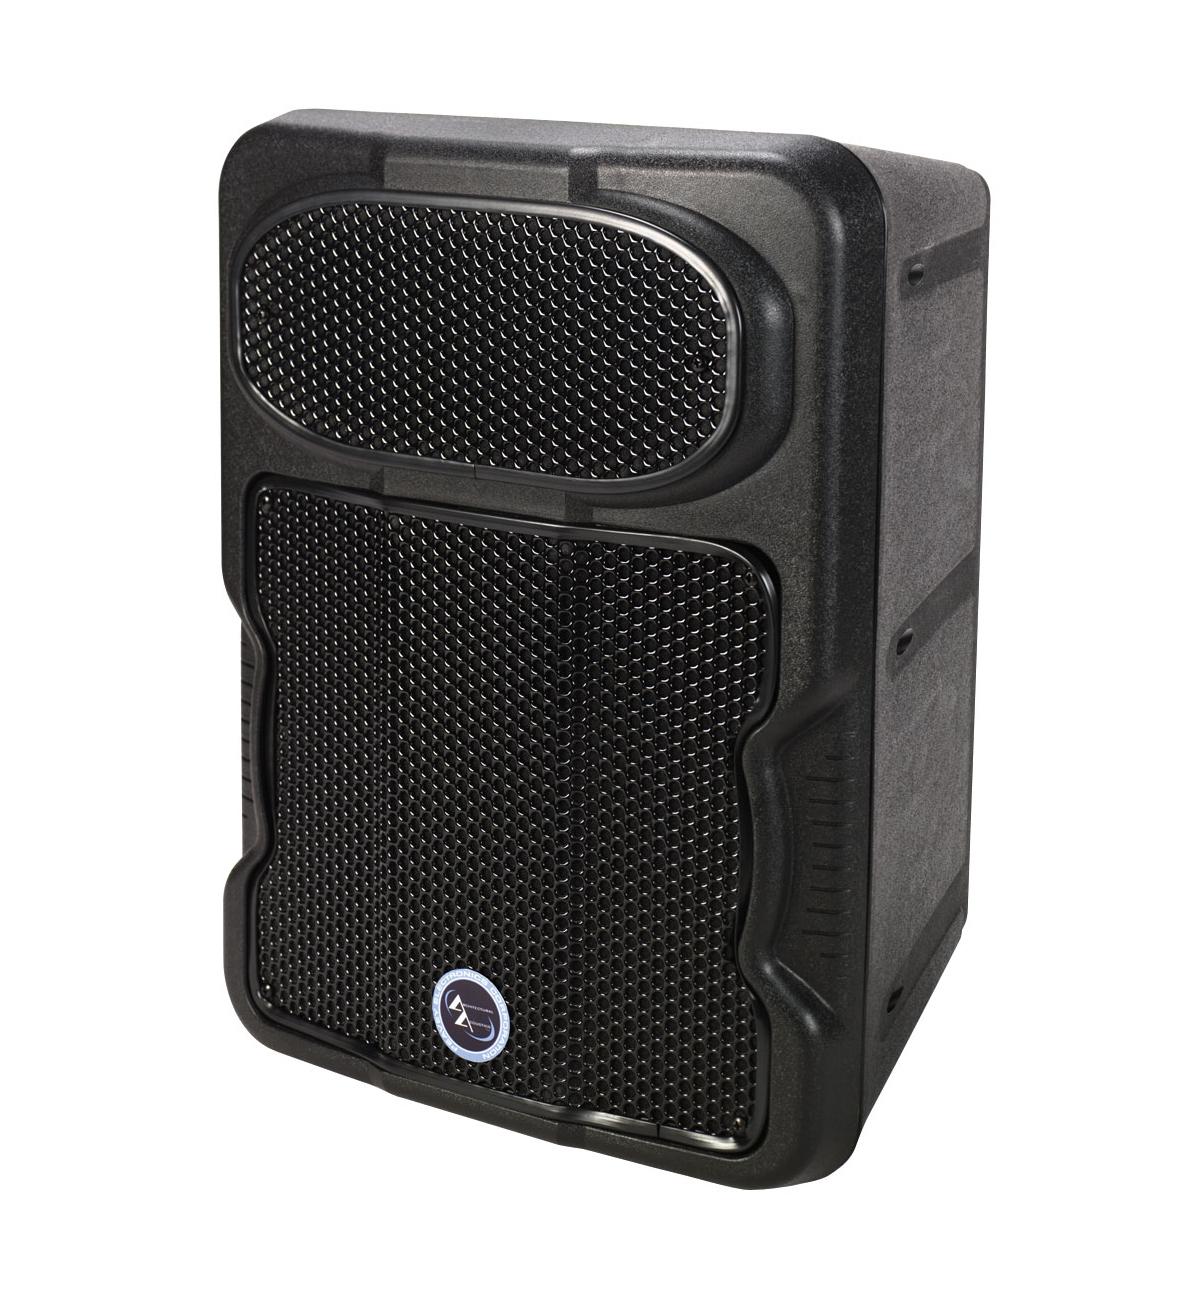 "Peavey QUADRA10-BLACK [RESTOCK ITEM] 10"" 2-Way Speaker (Black) QUADRA10-BLAC-RST-01"